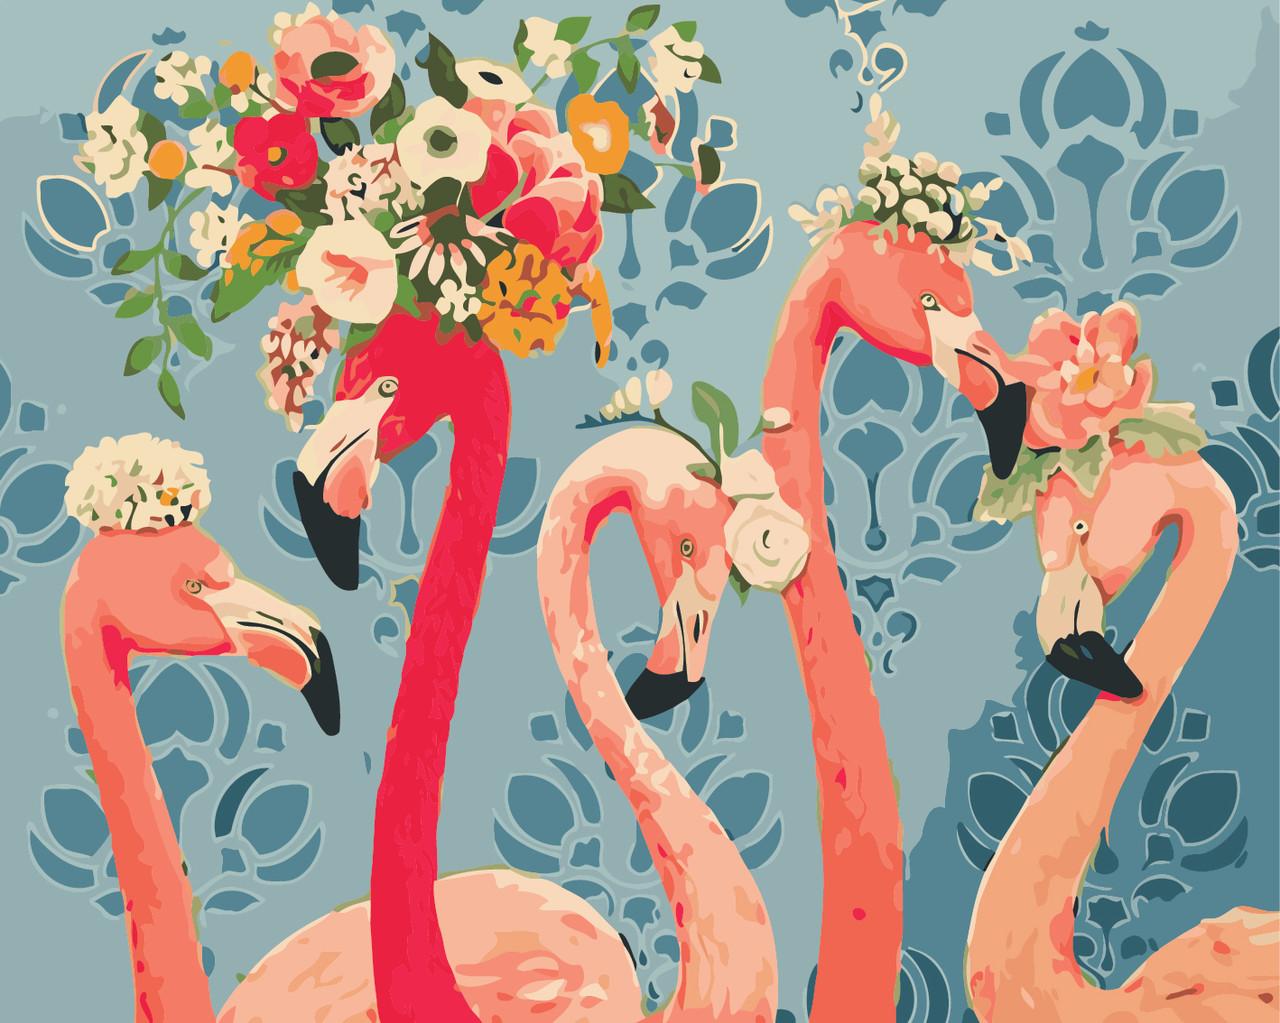 Картина по номерам Красотки фламинго 40 х 50 см (AS0408)